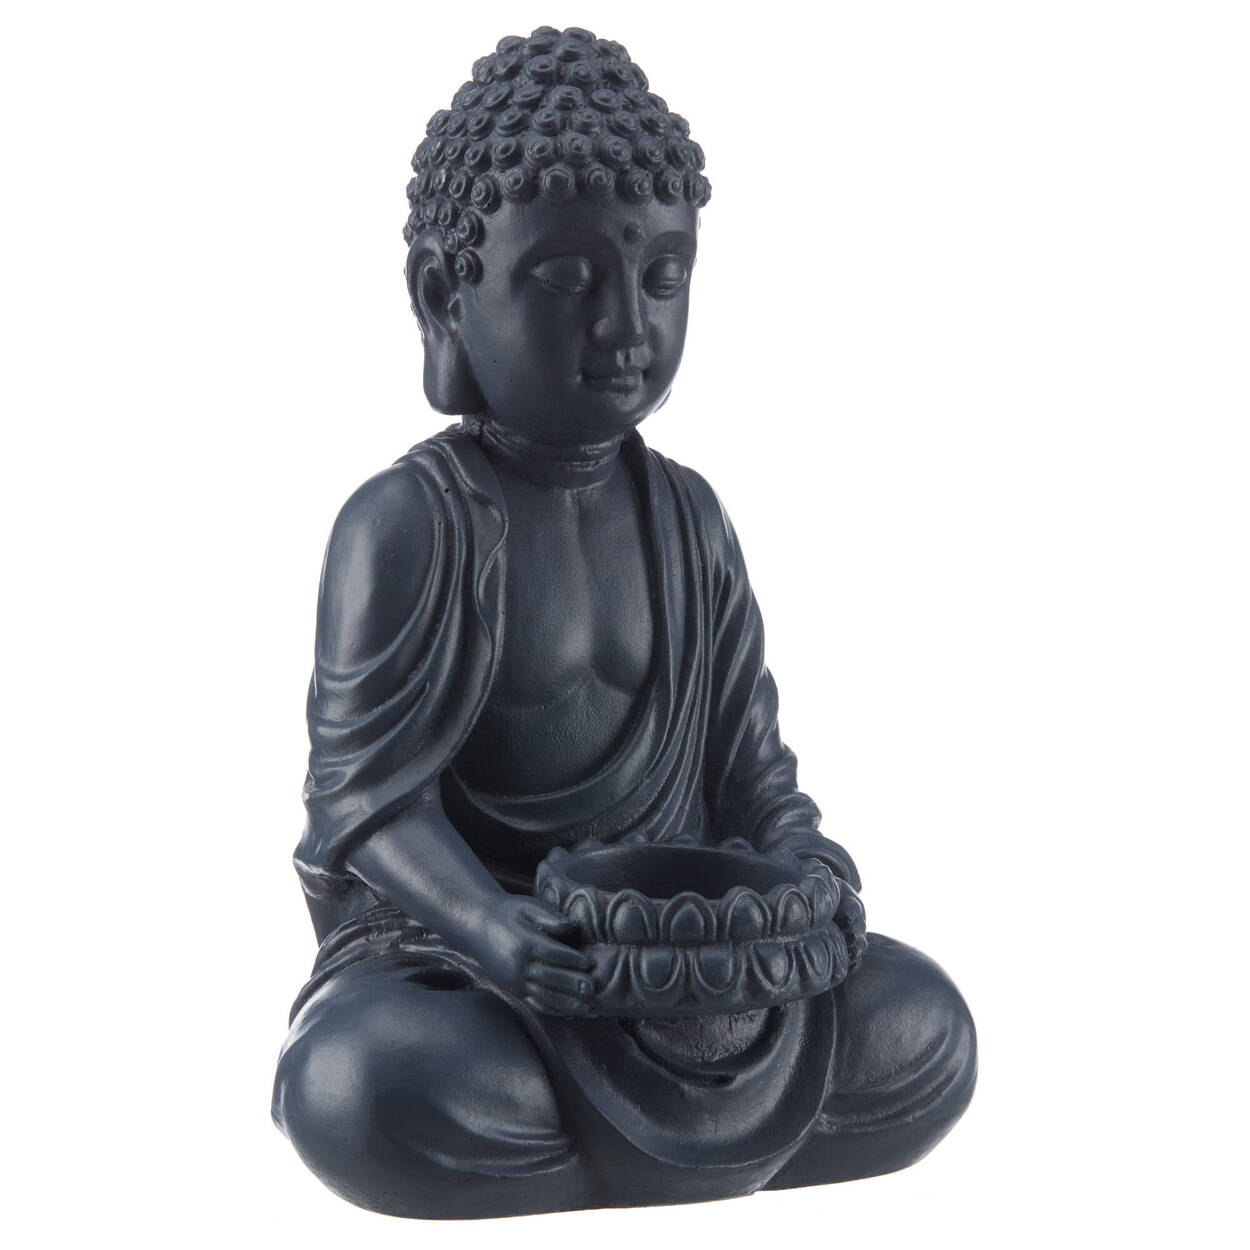 Porte-chandelle Bouddha en ciment noir